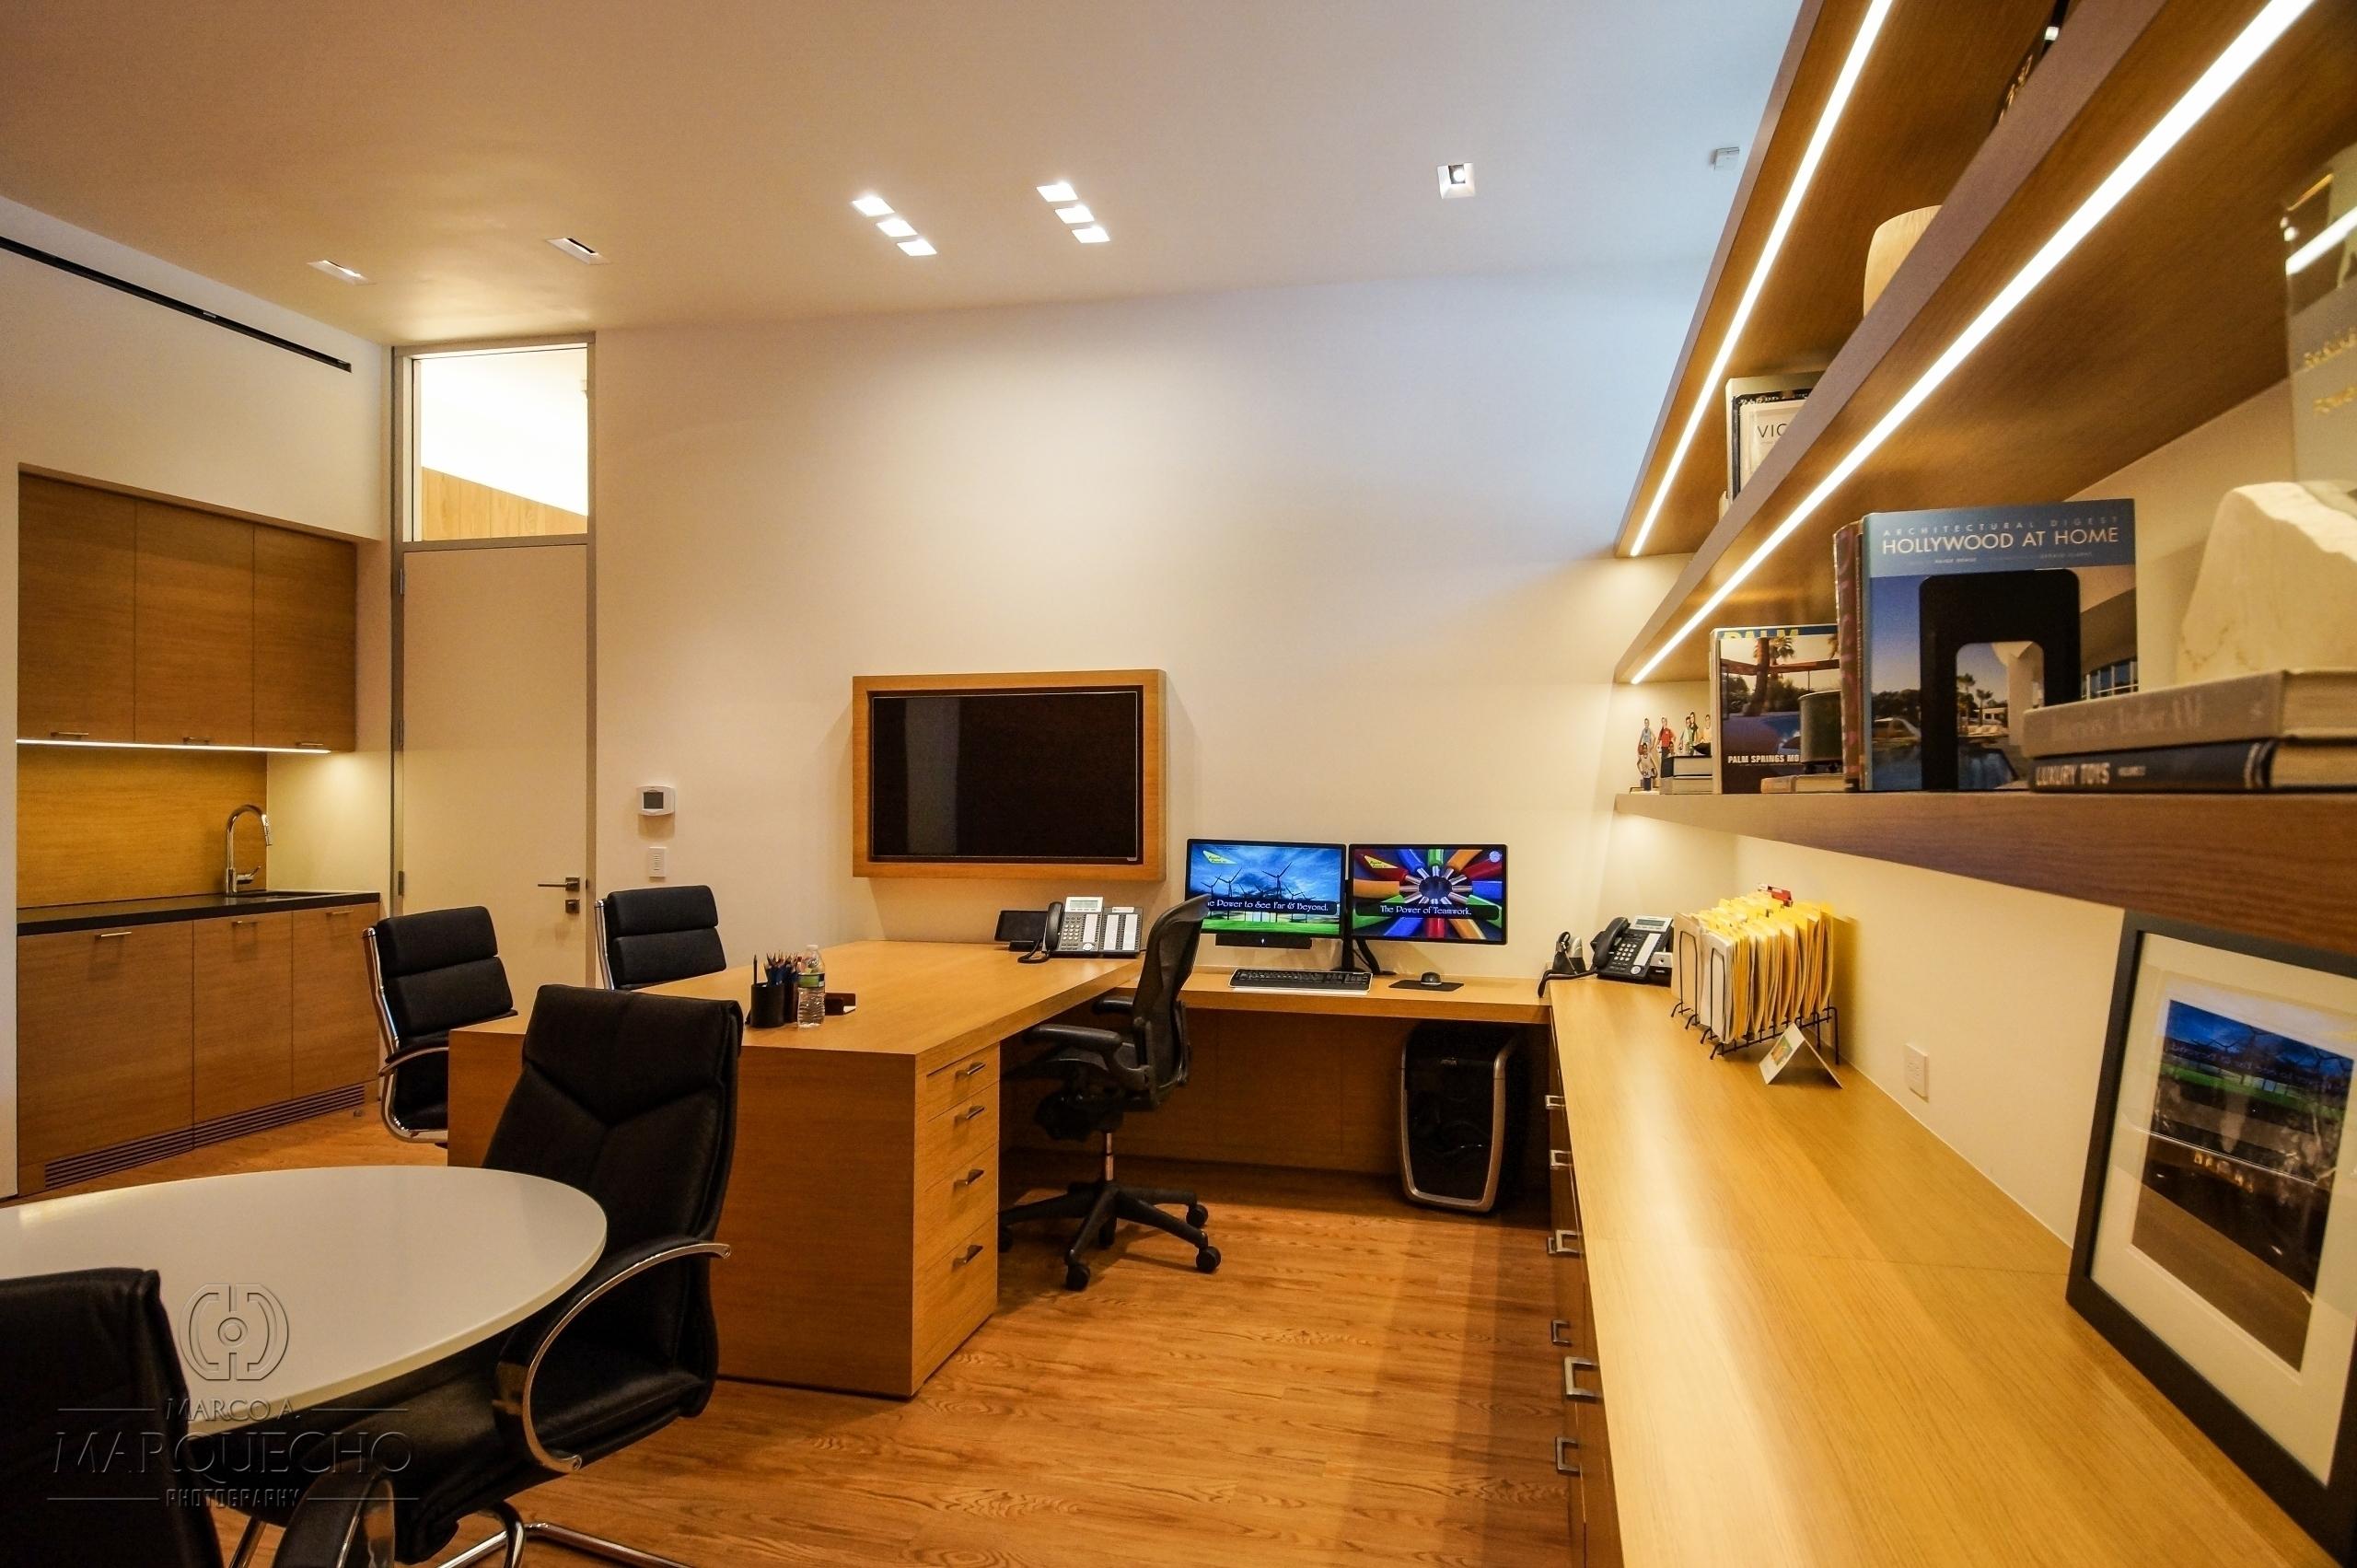 Modern Interior Design Office  - marquecho | ello